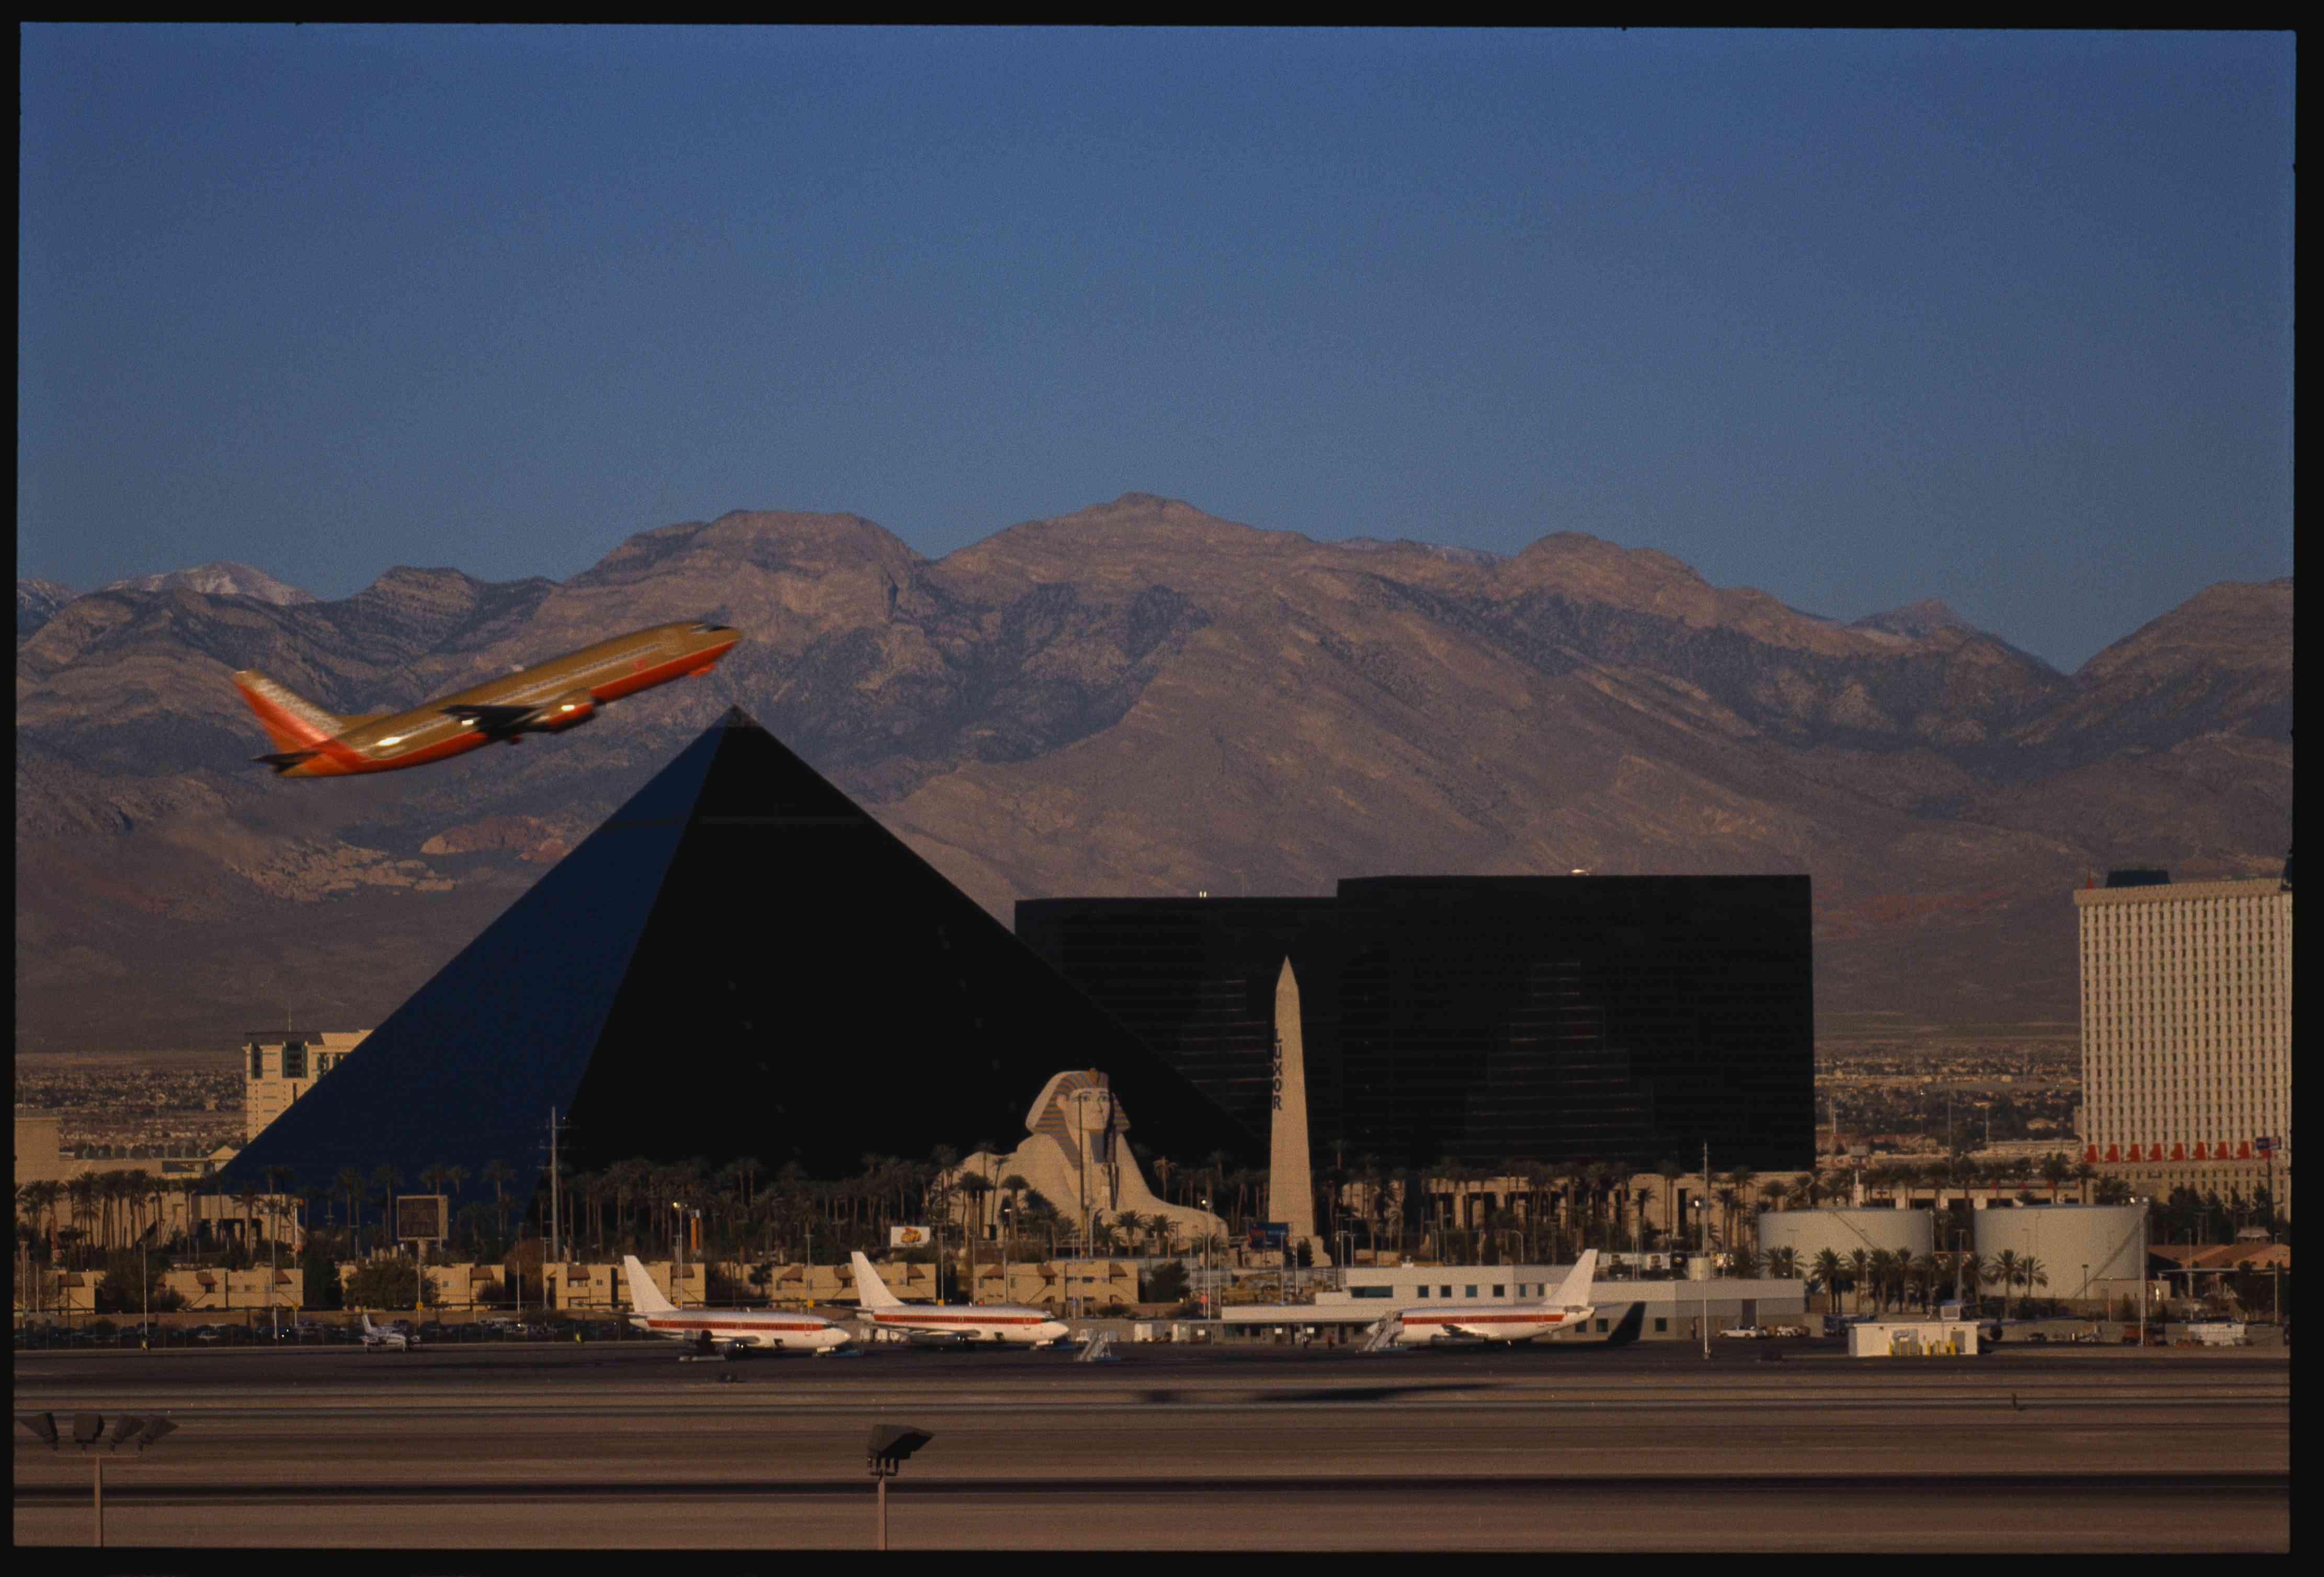 McCarran International Airport and Luxor Hotel